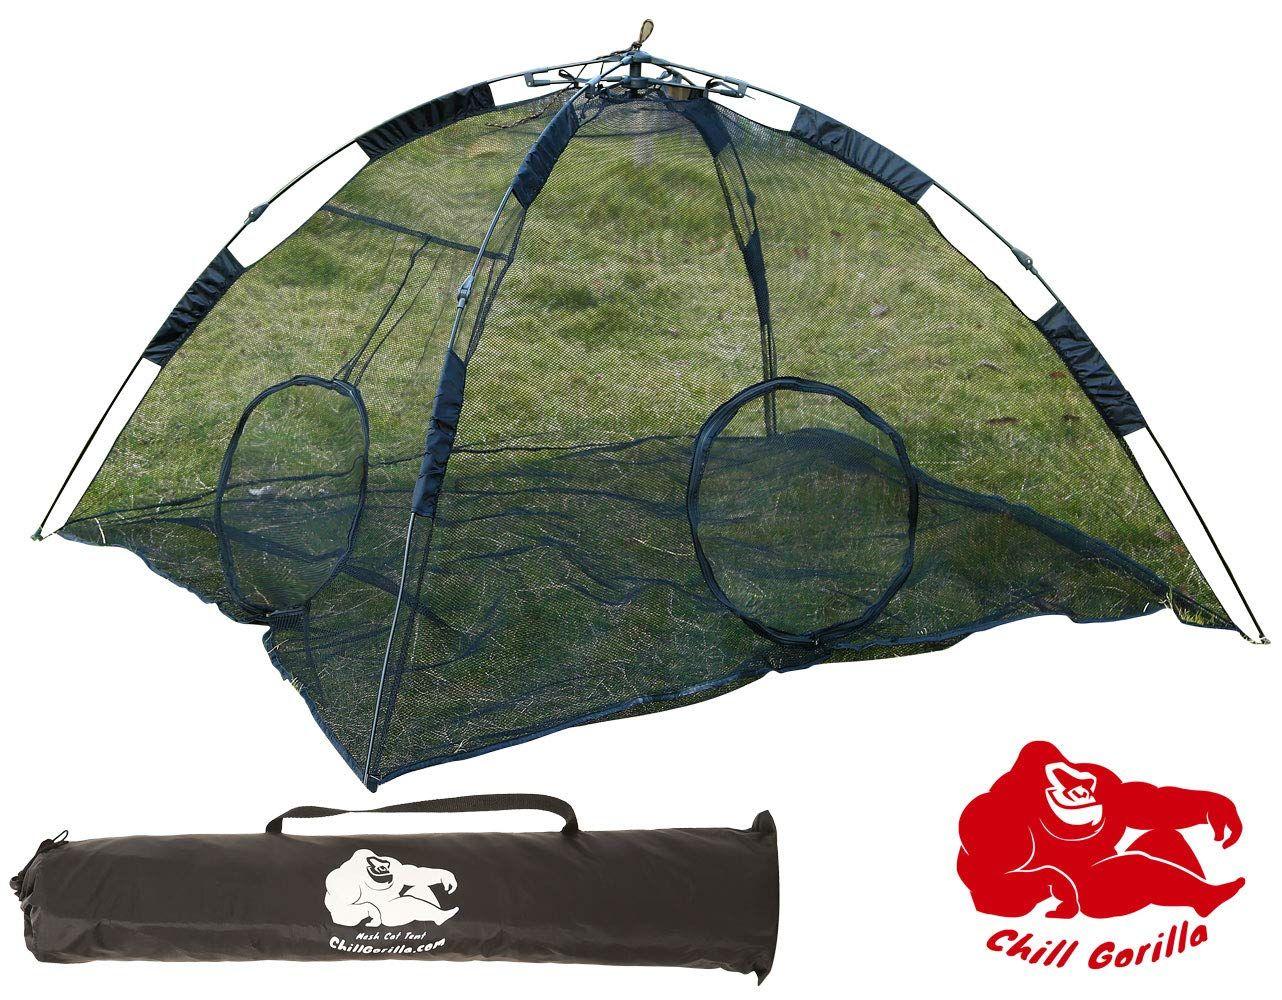 Perfect Pet Enclosure /& Playpen for Indoor /& Outdoor Pets Chill Gorilla Portable Cat Tent Tent /& Playhouse